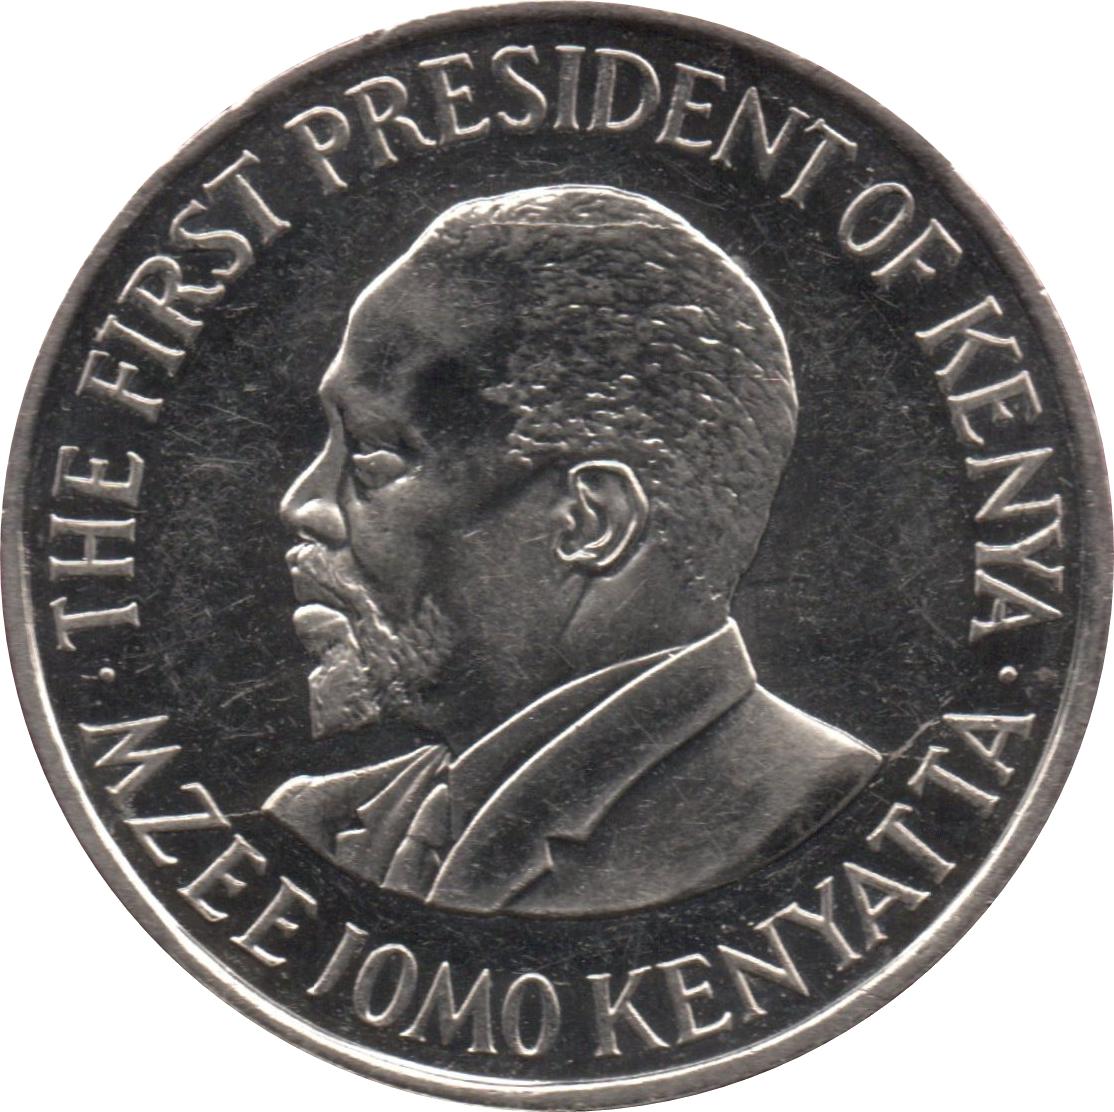 KENYA 1 SHILLINGS 2010 UNC FIRST PRESIDENT BUST OF MZEE JOMO KENYATTA LEFT,NATIO